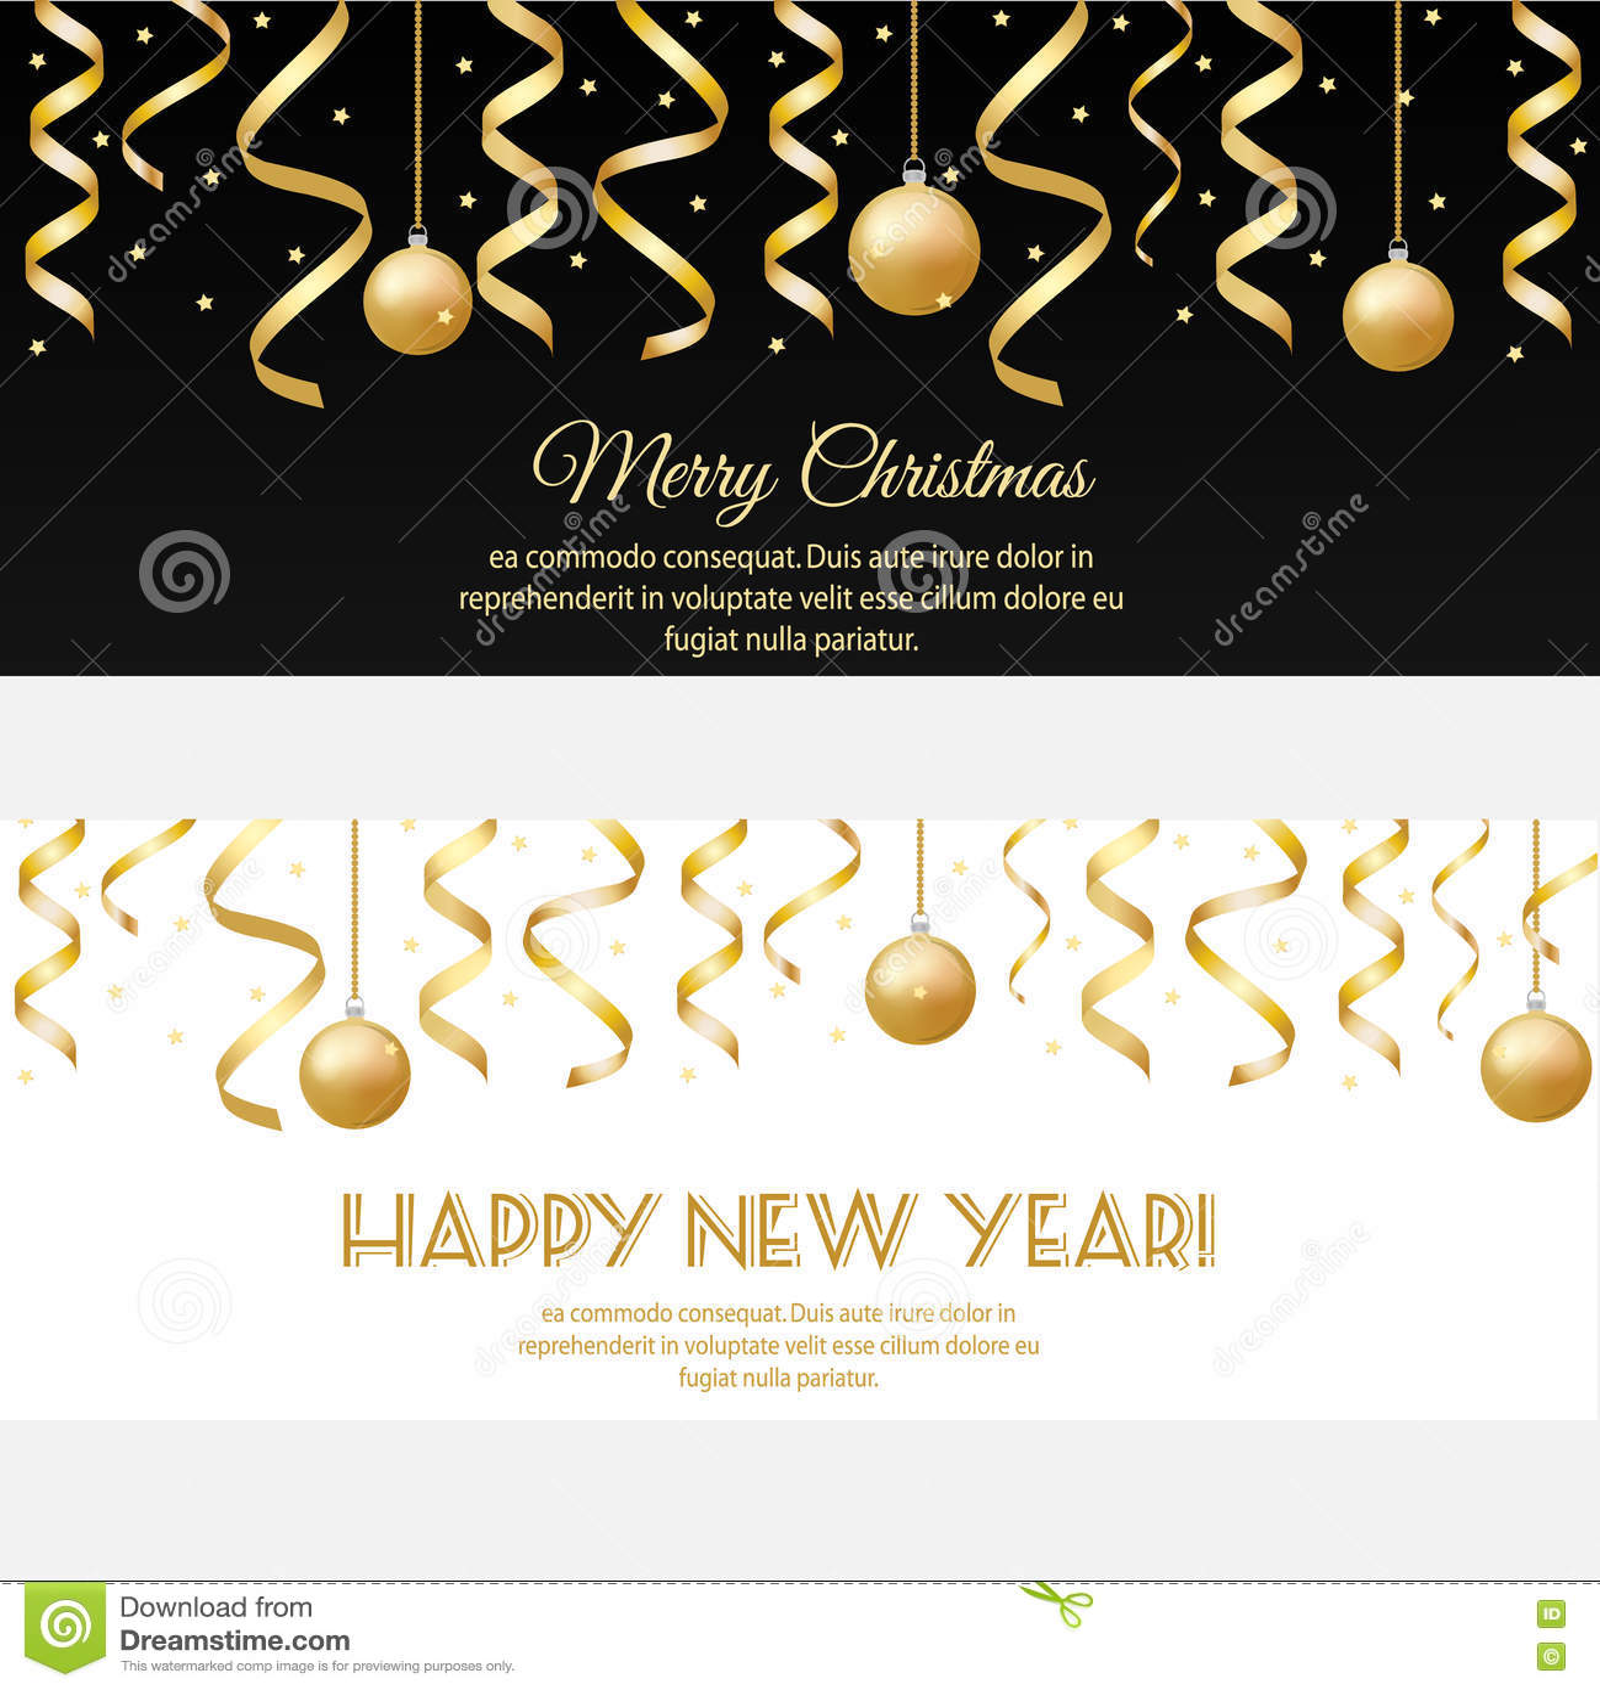 Merry christmas happy new year horizontal banners with golden download merry christmas happy new year horizontal banners with golden streamers and baubles stock vector stopboris Gallery